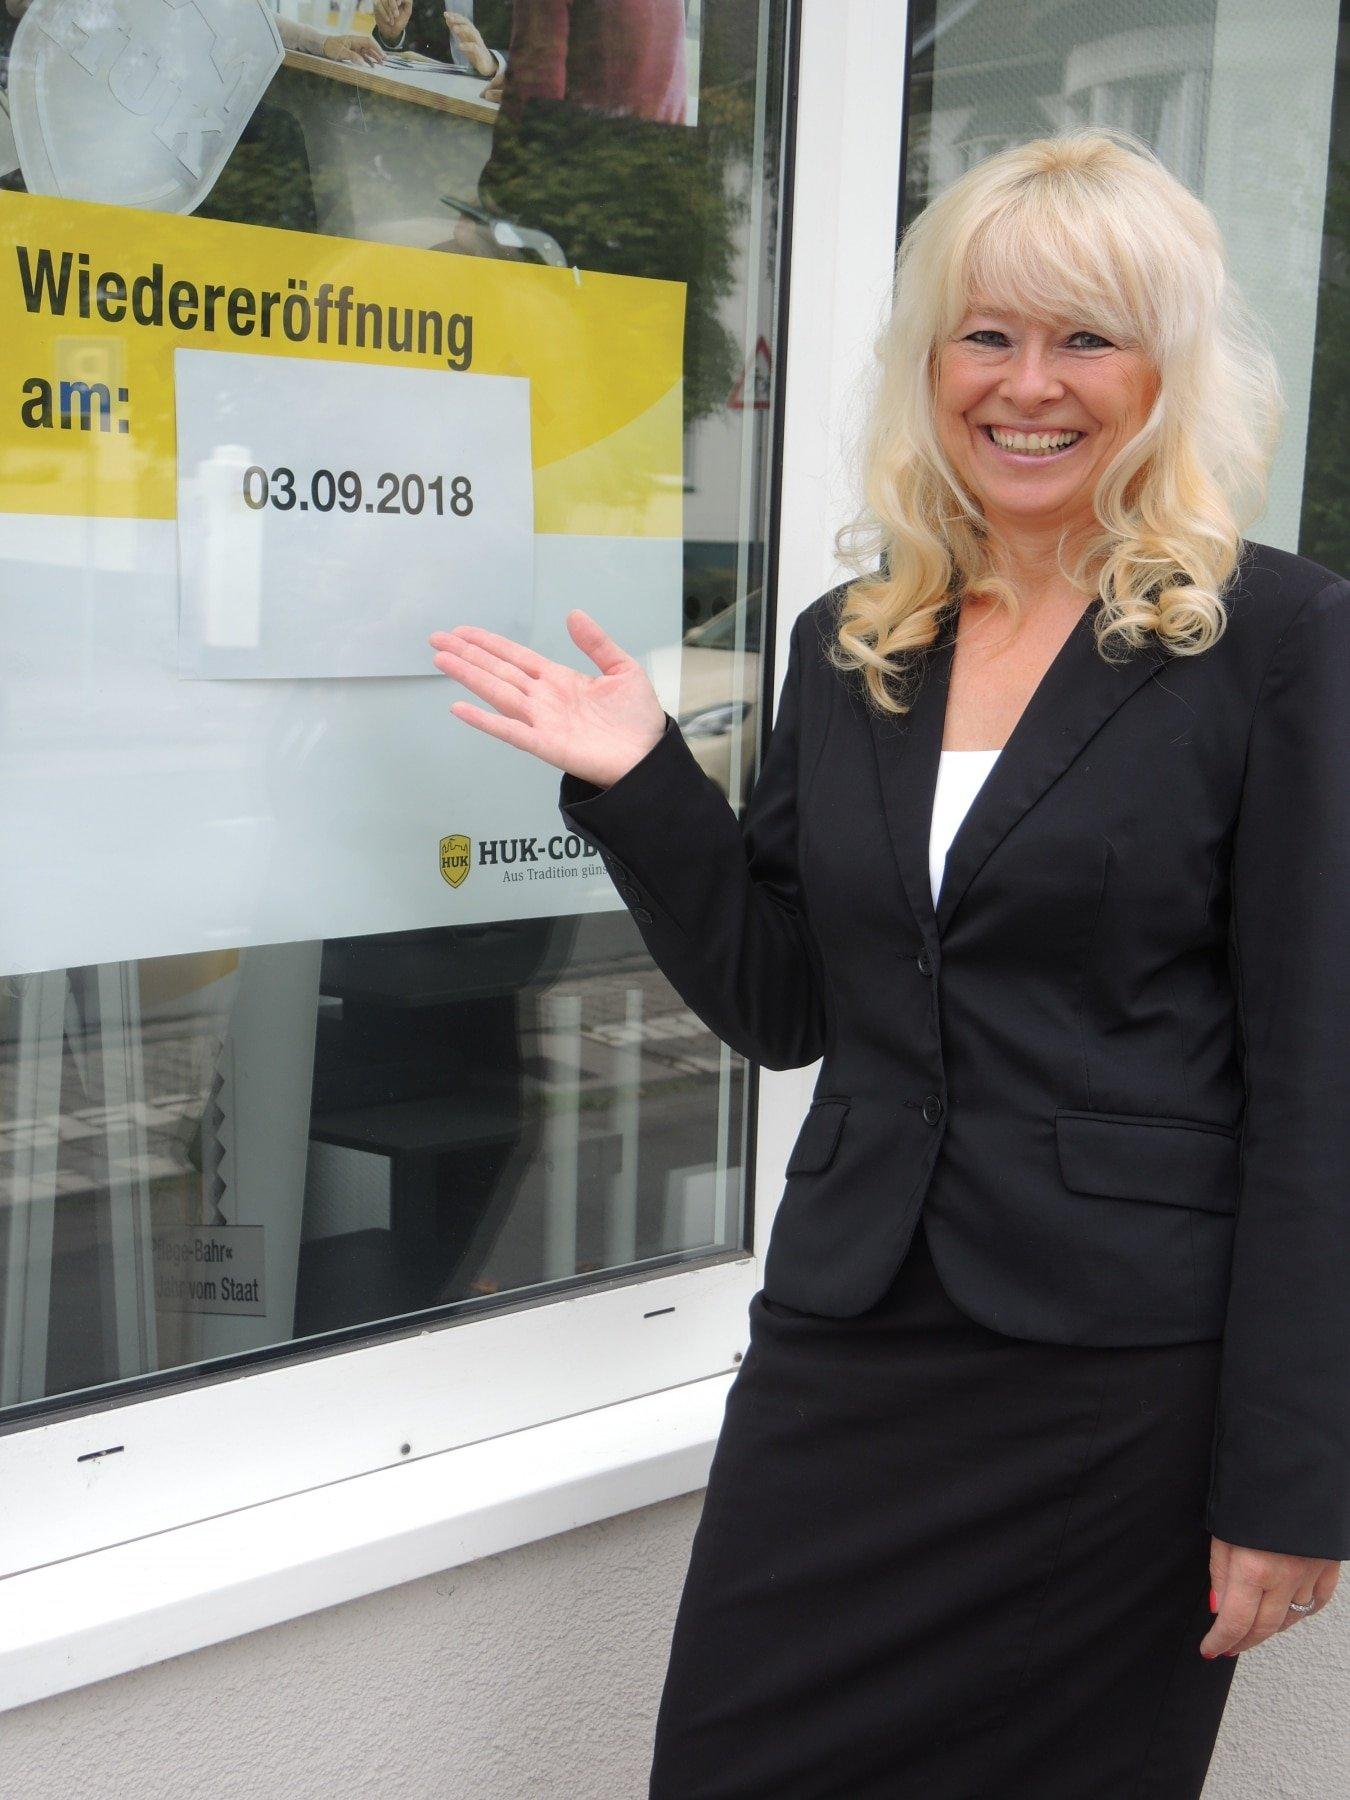 Dank Top Beratung Bestens Abgesichert In Stadtmagazine